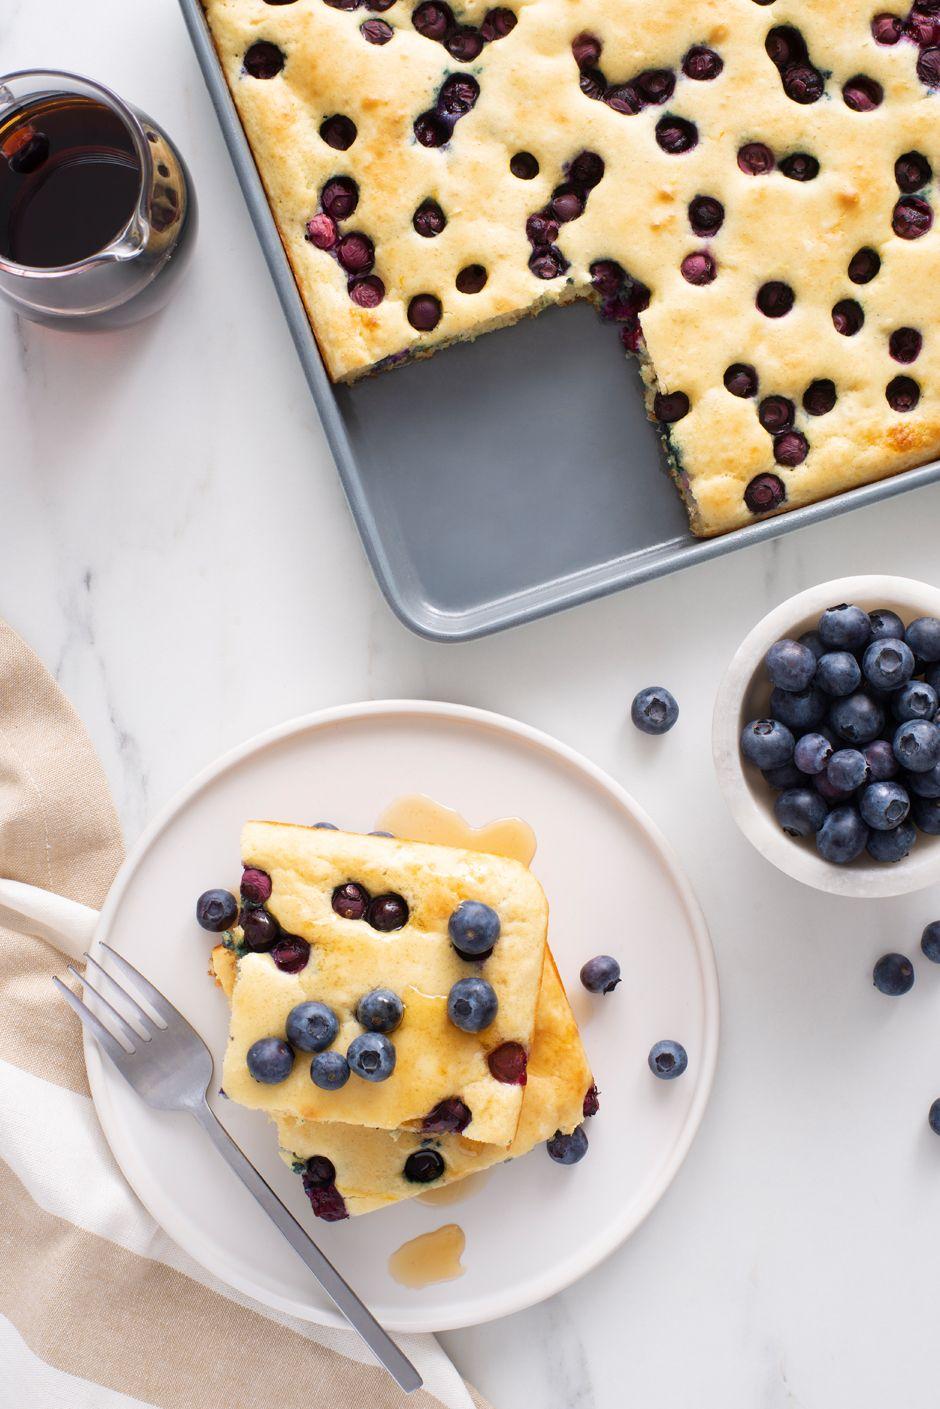 Sheet Pan Blueberry Pancakes Recipe in 2020 Blueberry